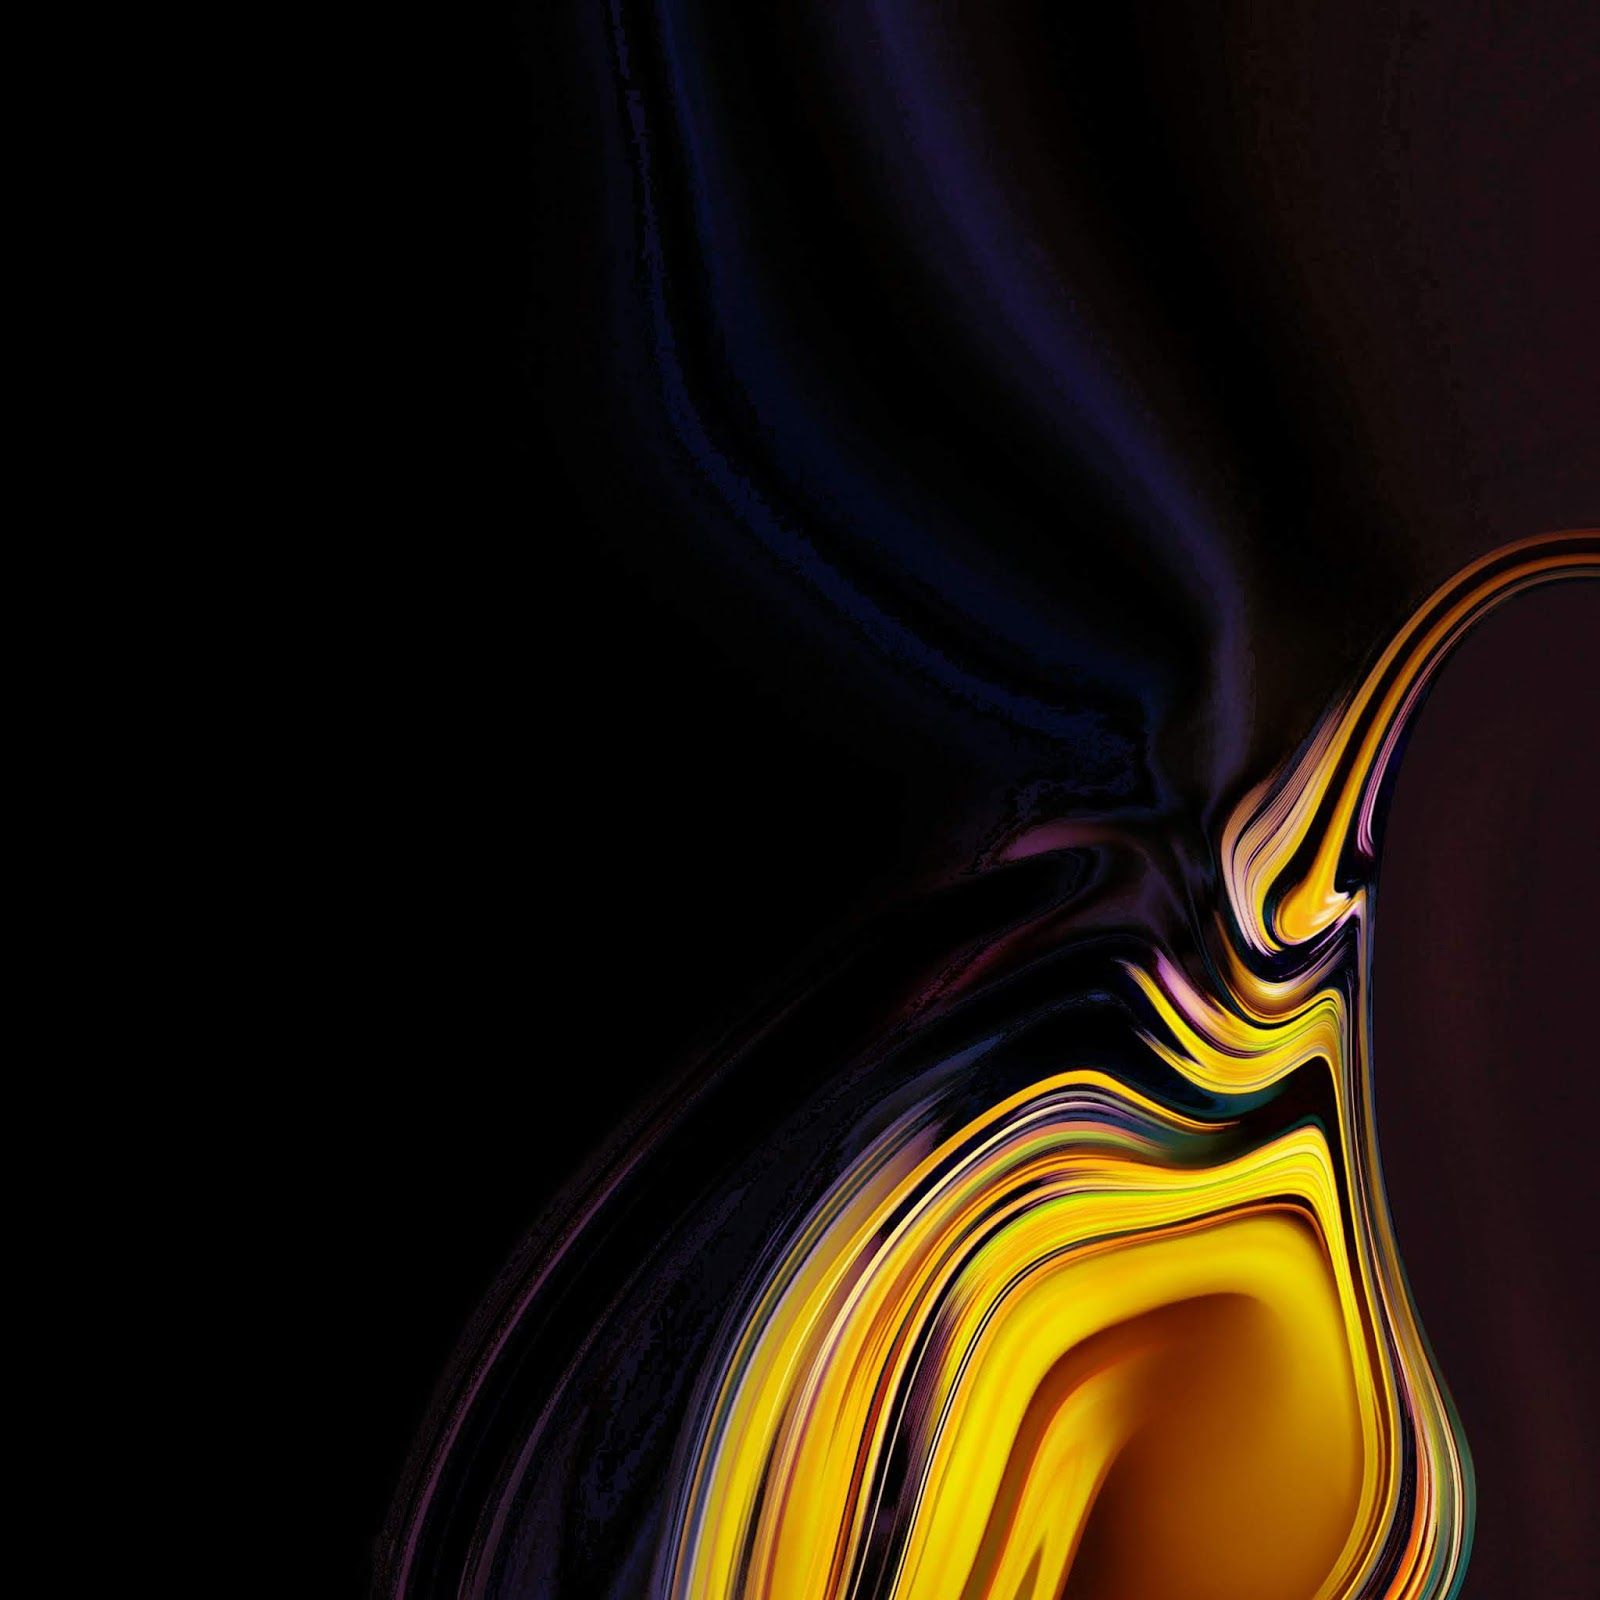 Samsung Galaxy Note 9 Hd Wallpaper Download Sfondi Super Qhd Sfondi